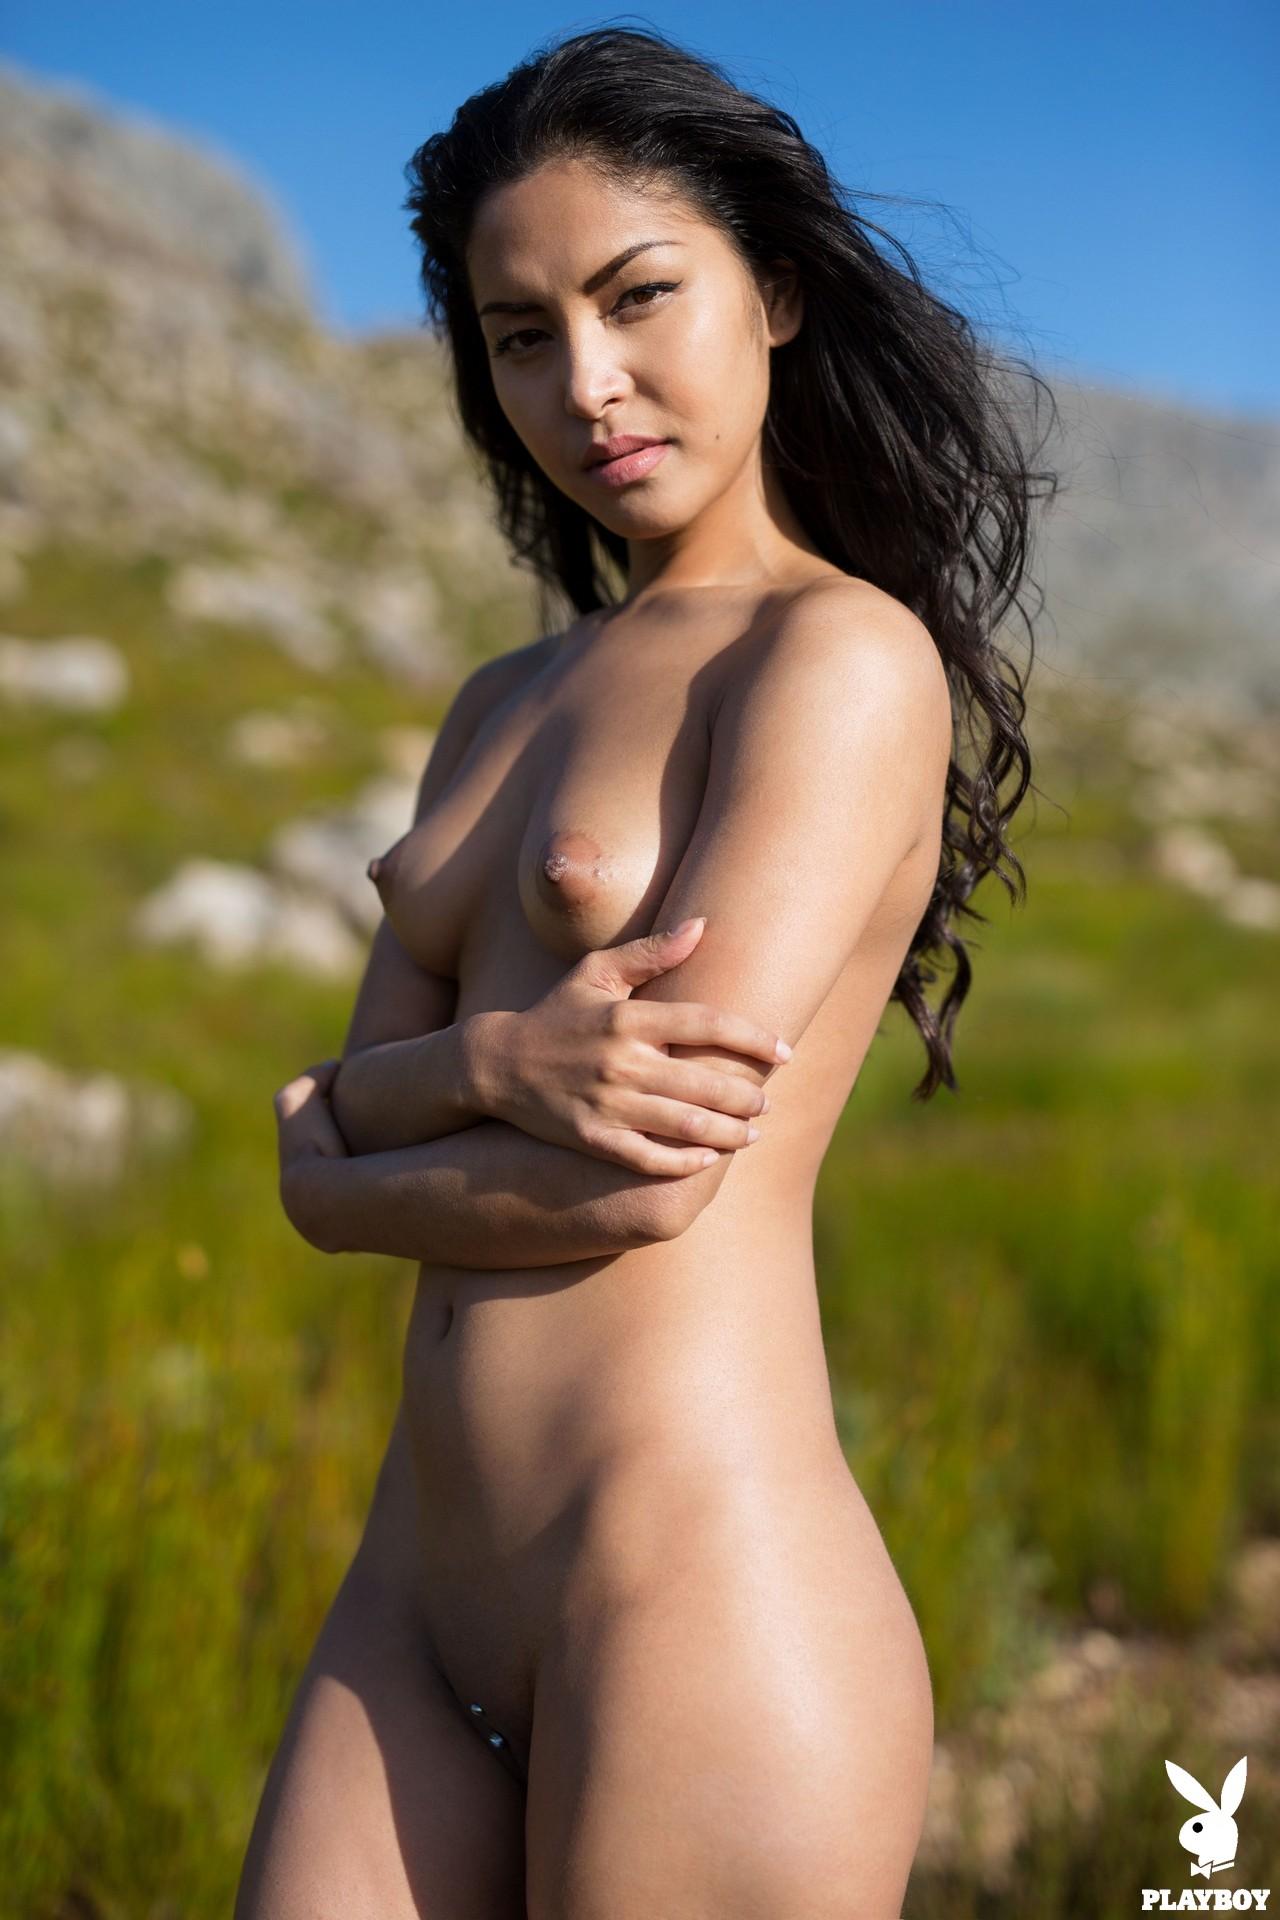 Chloe Rose in Trail Blazing 35